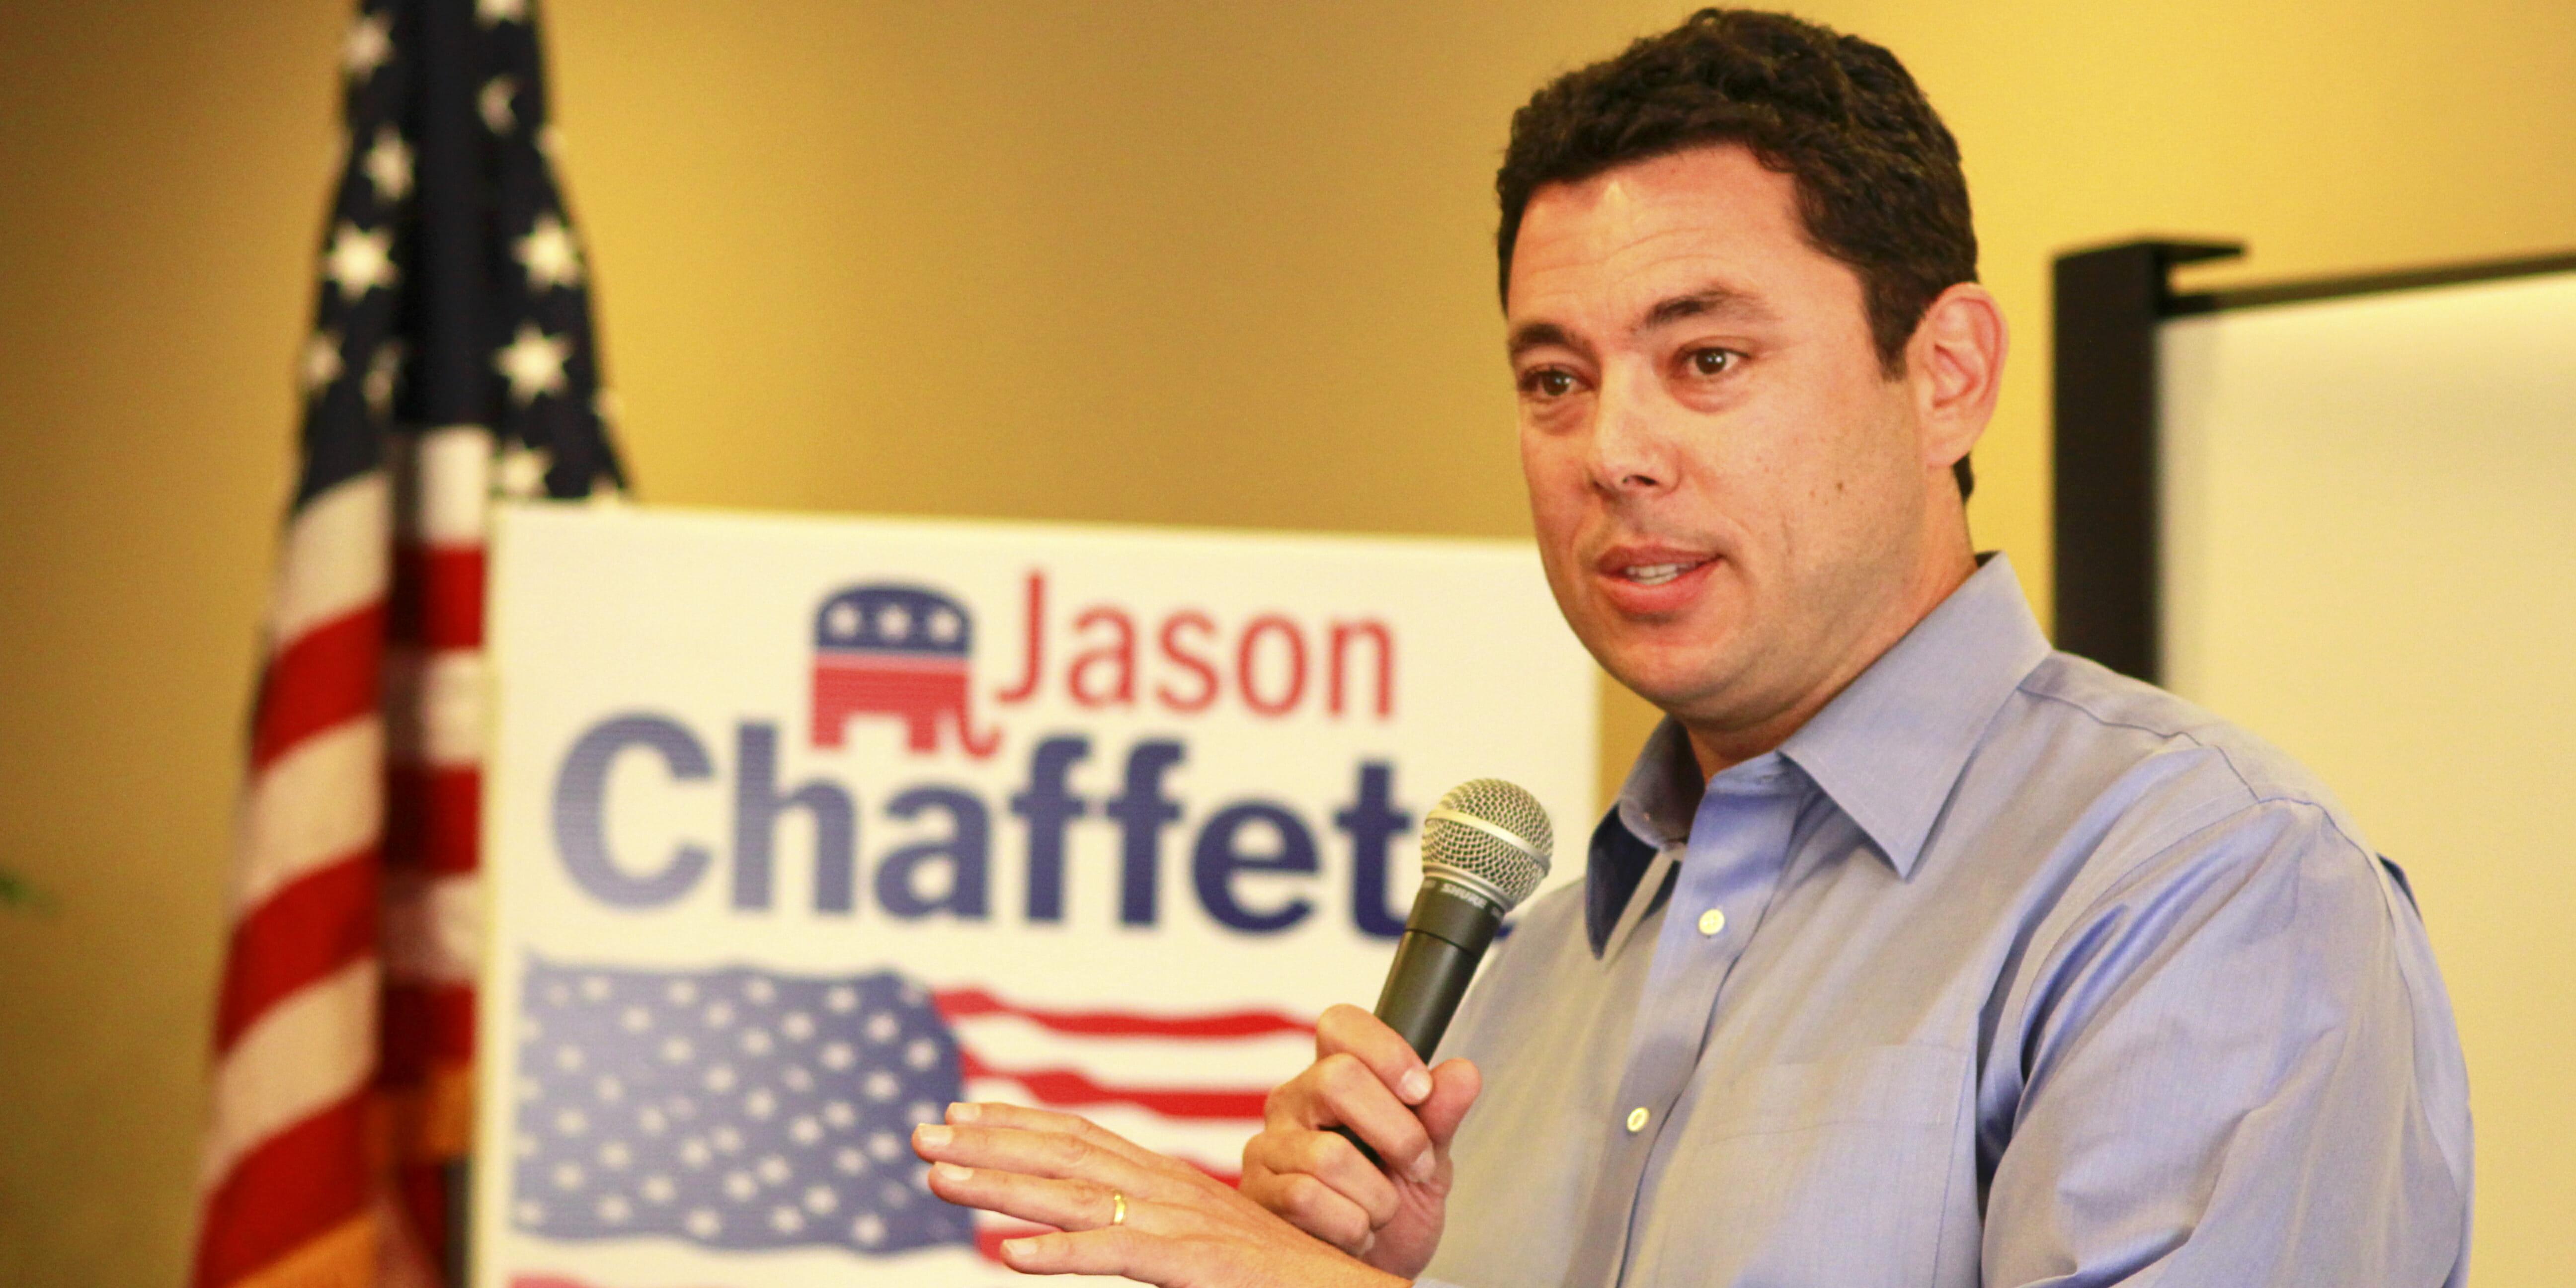 Rep. Jason Chaffetz Speaking with Microphone